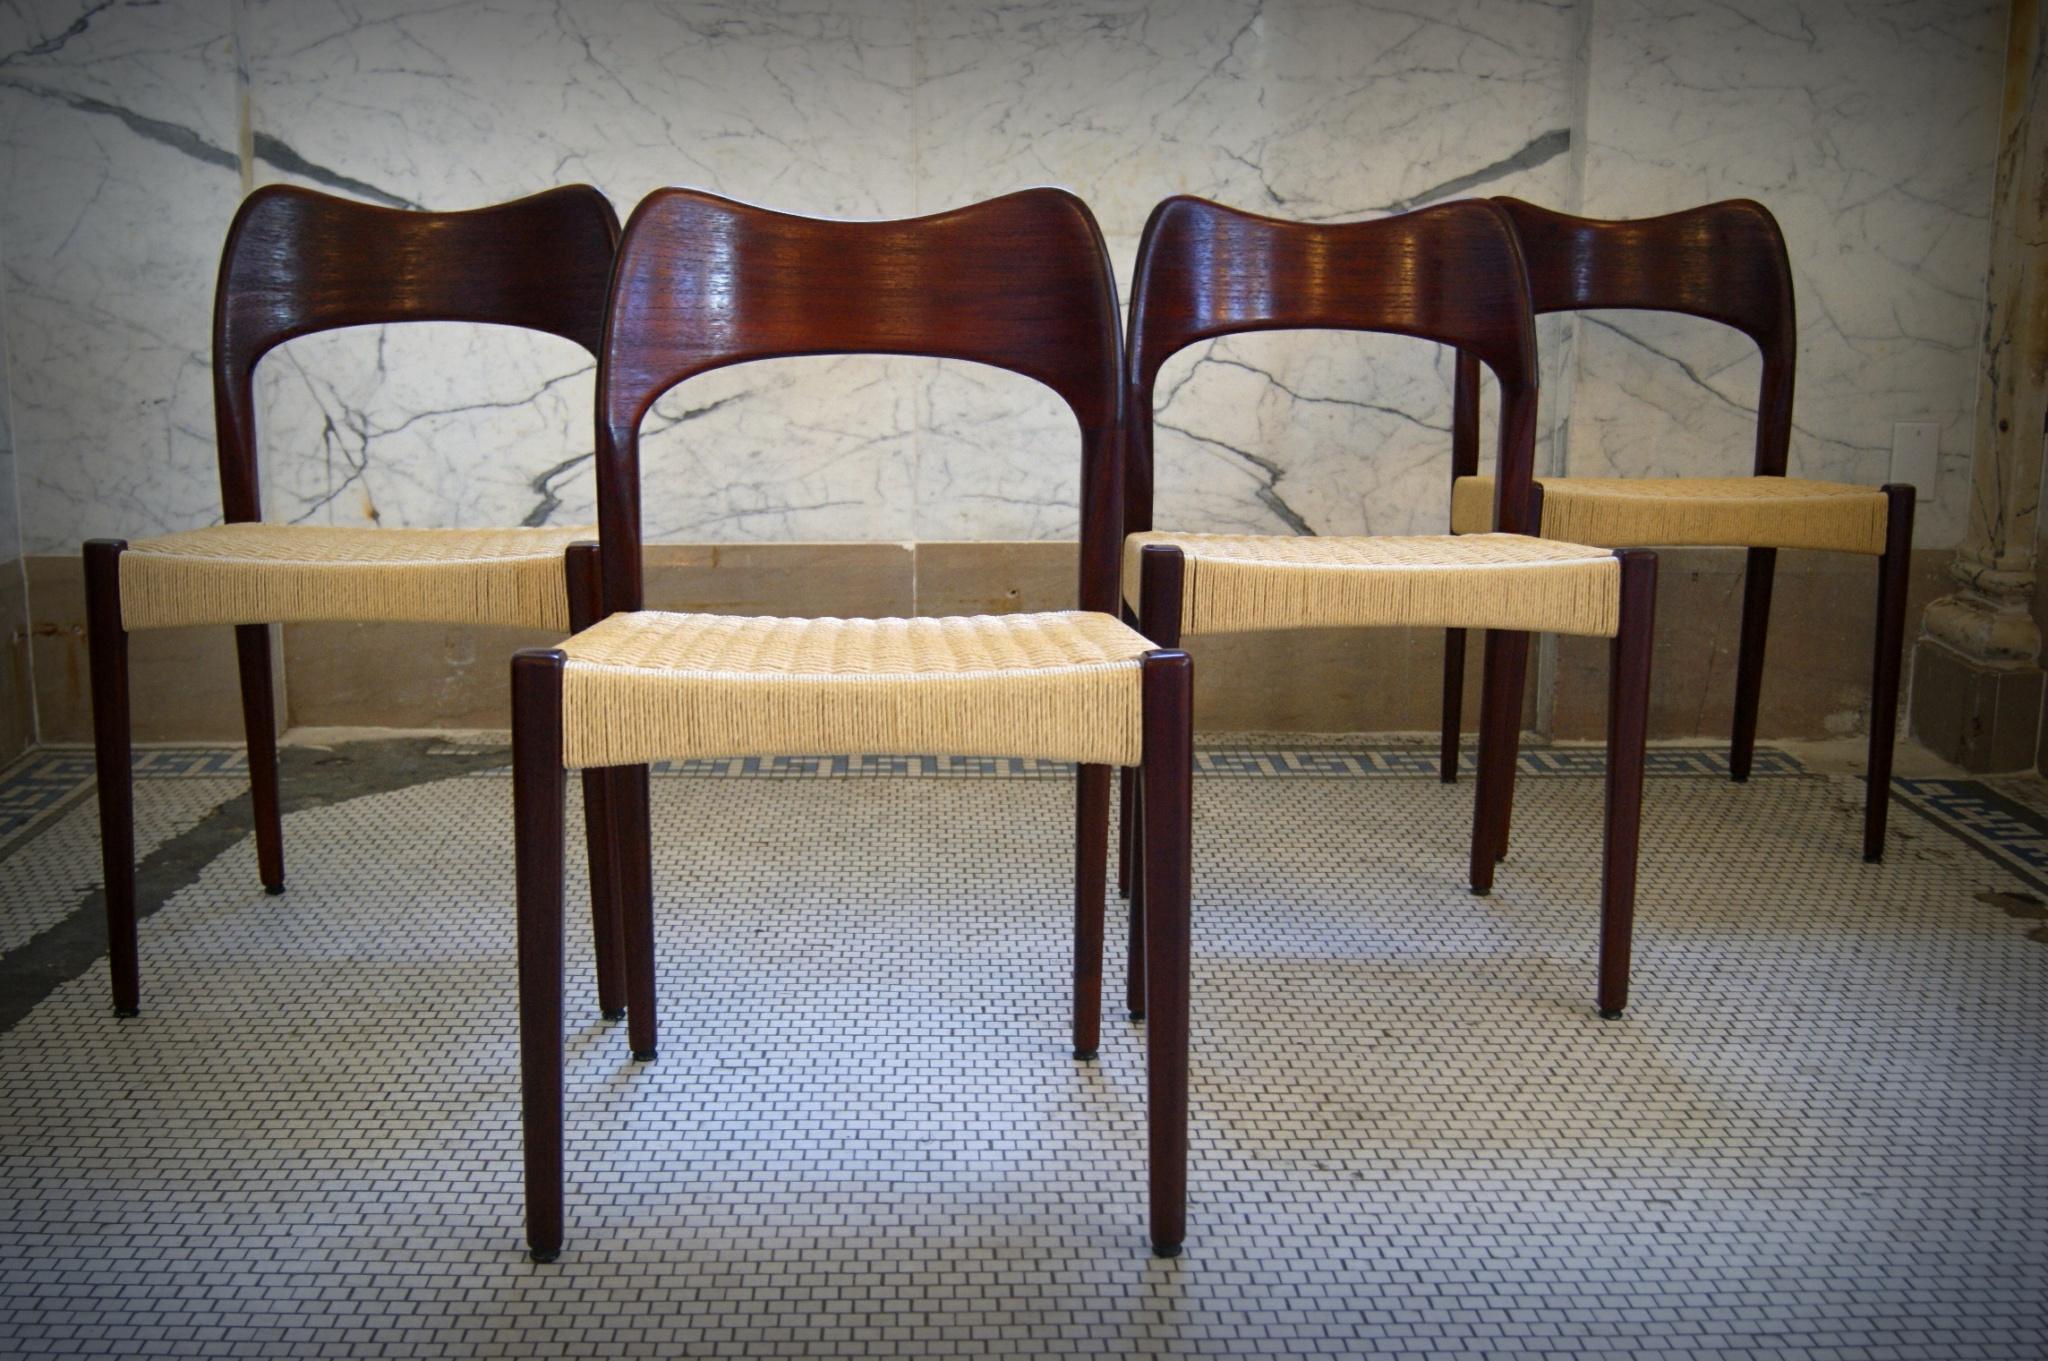 11_chairs_danishchord_FP - Copy (1).JPG